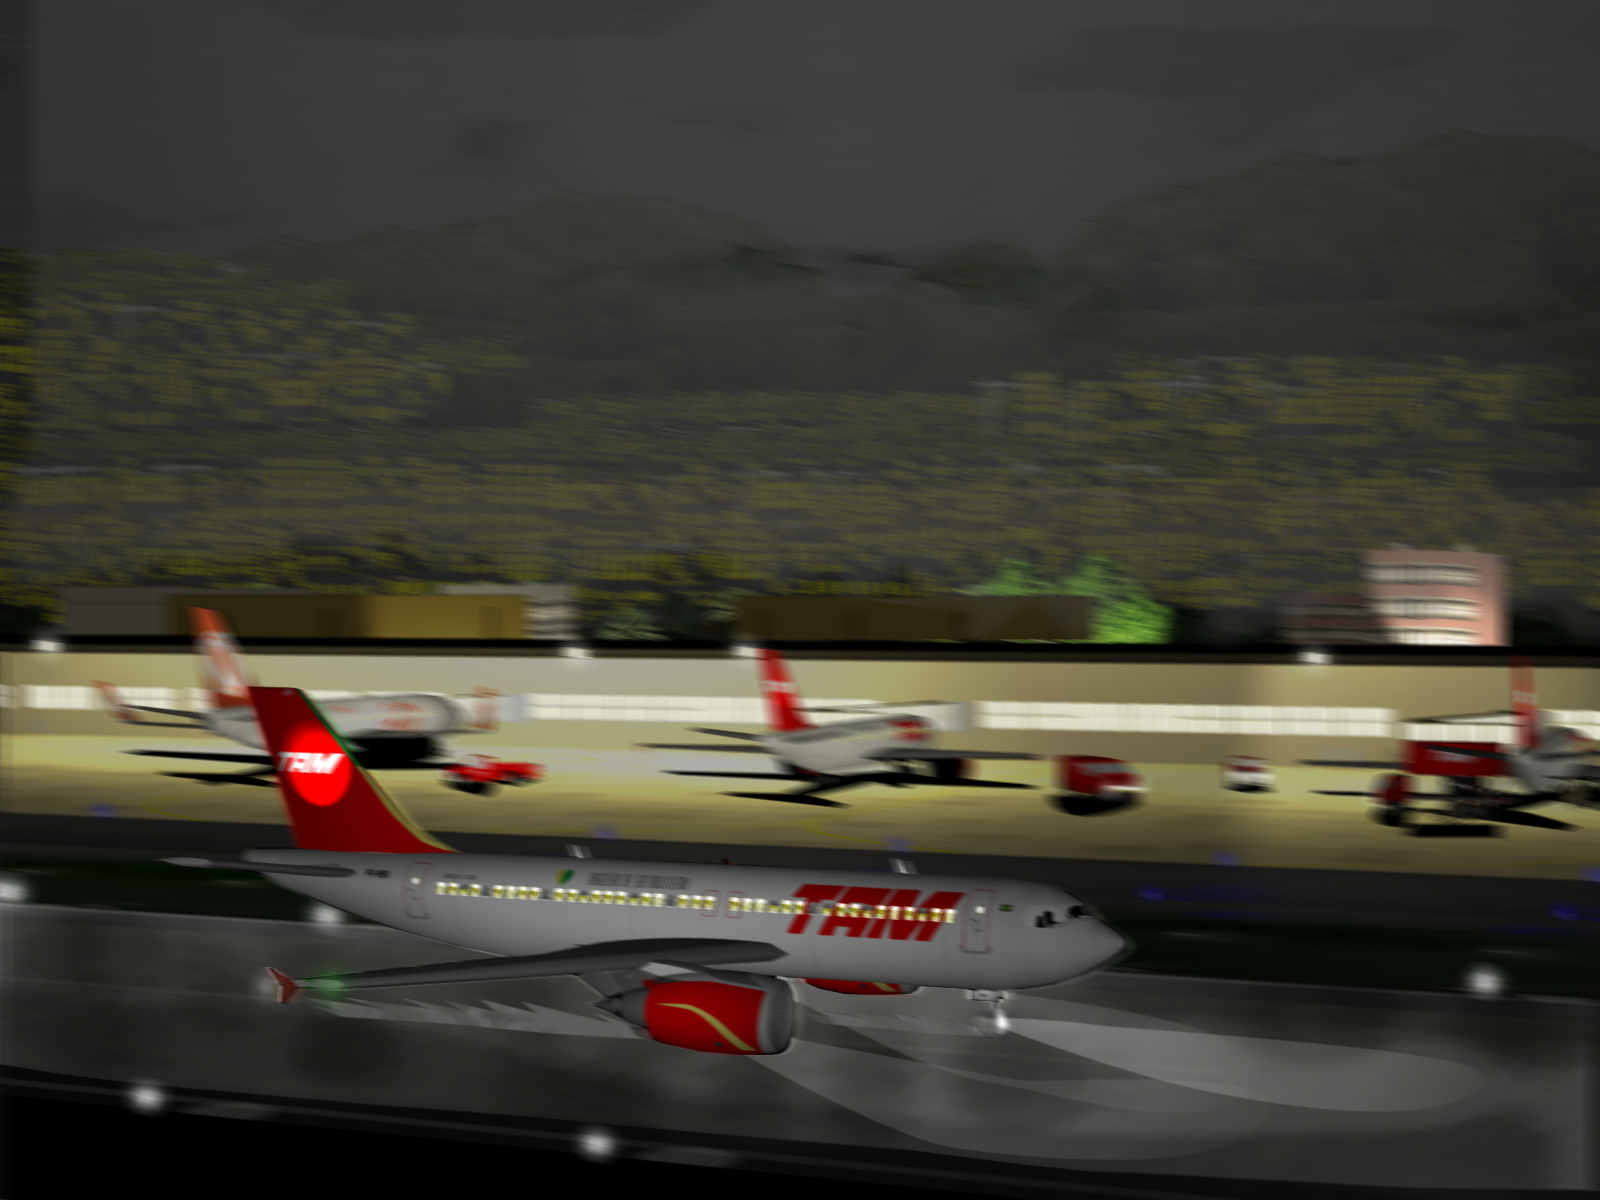 Car Design News Tam Flight 3054